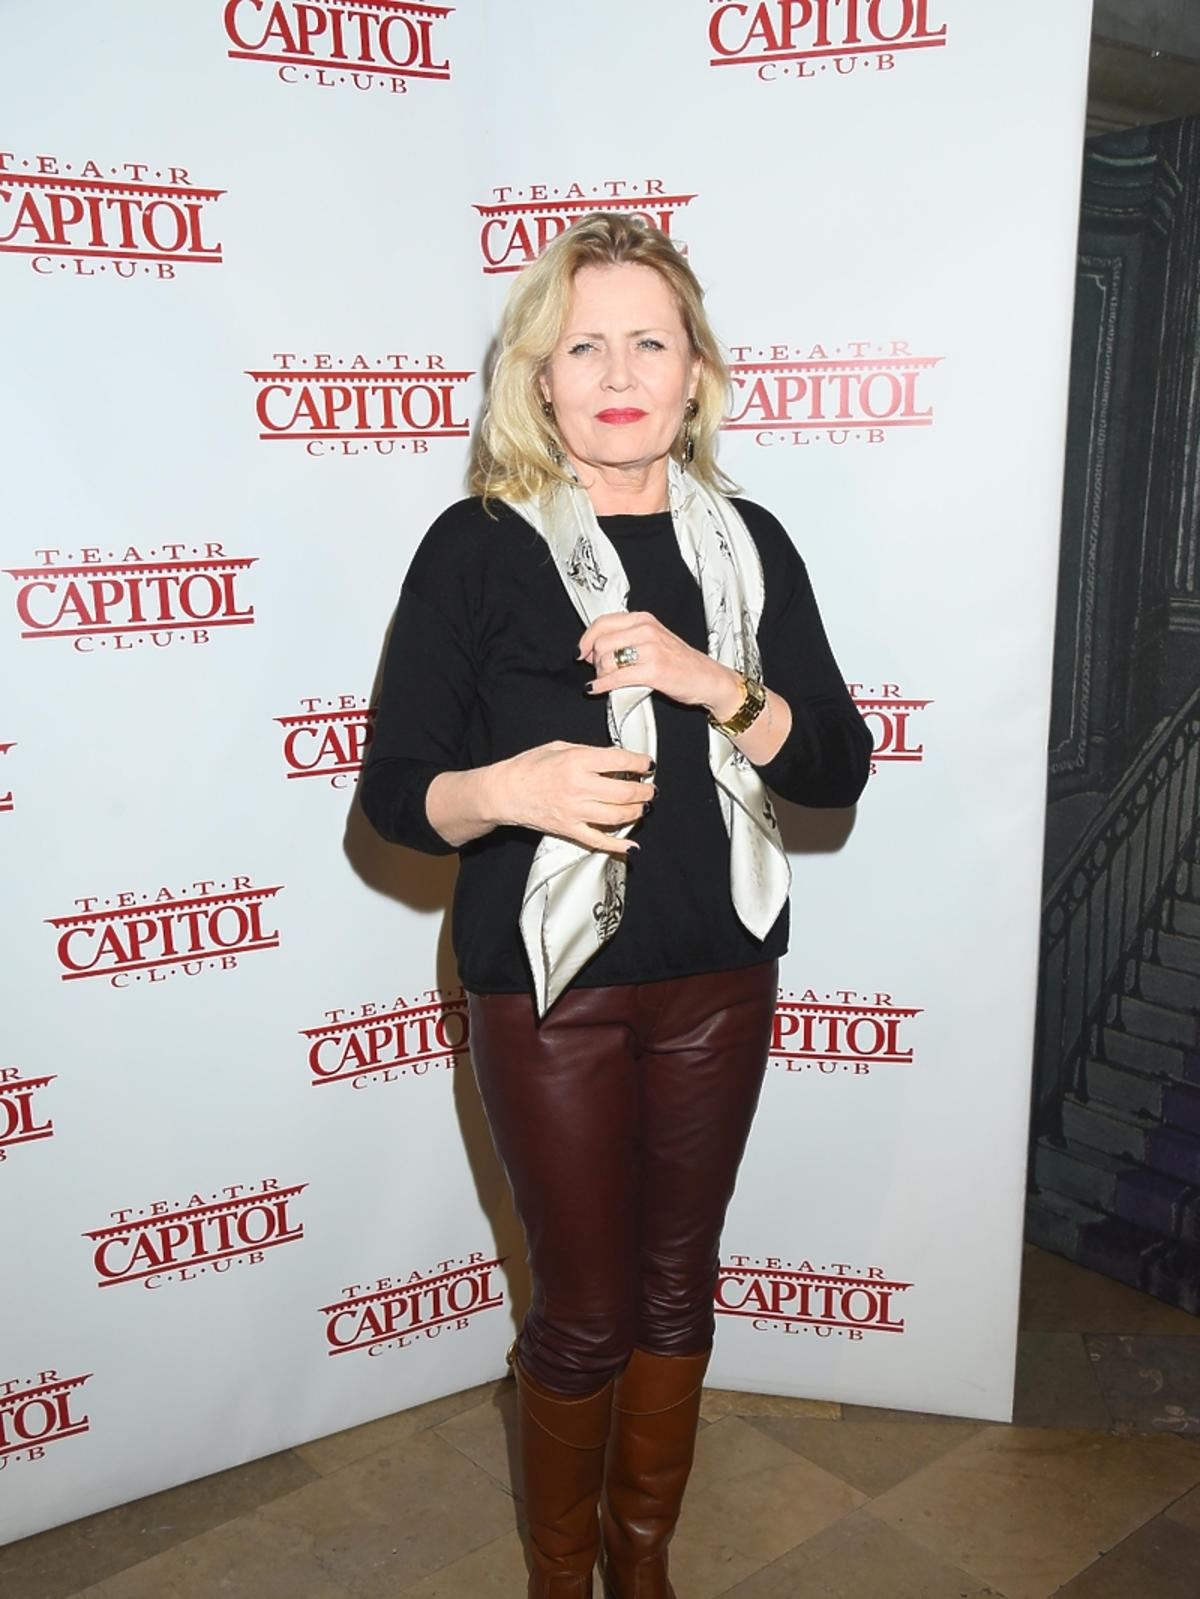 Beata Sadowska na premierze w Teatrze Capitol